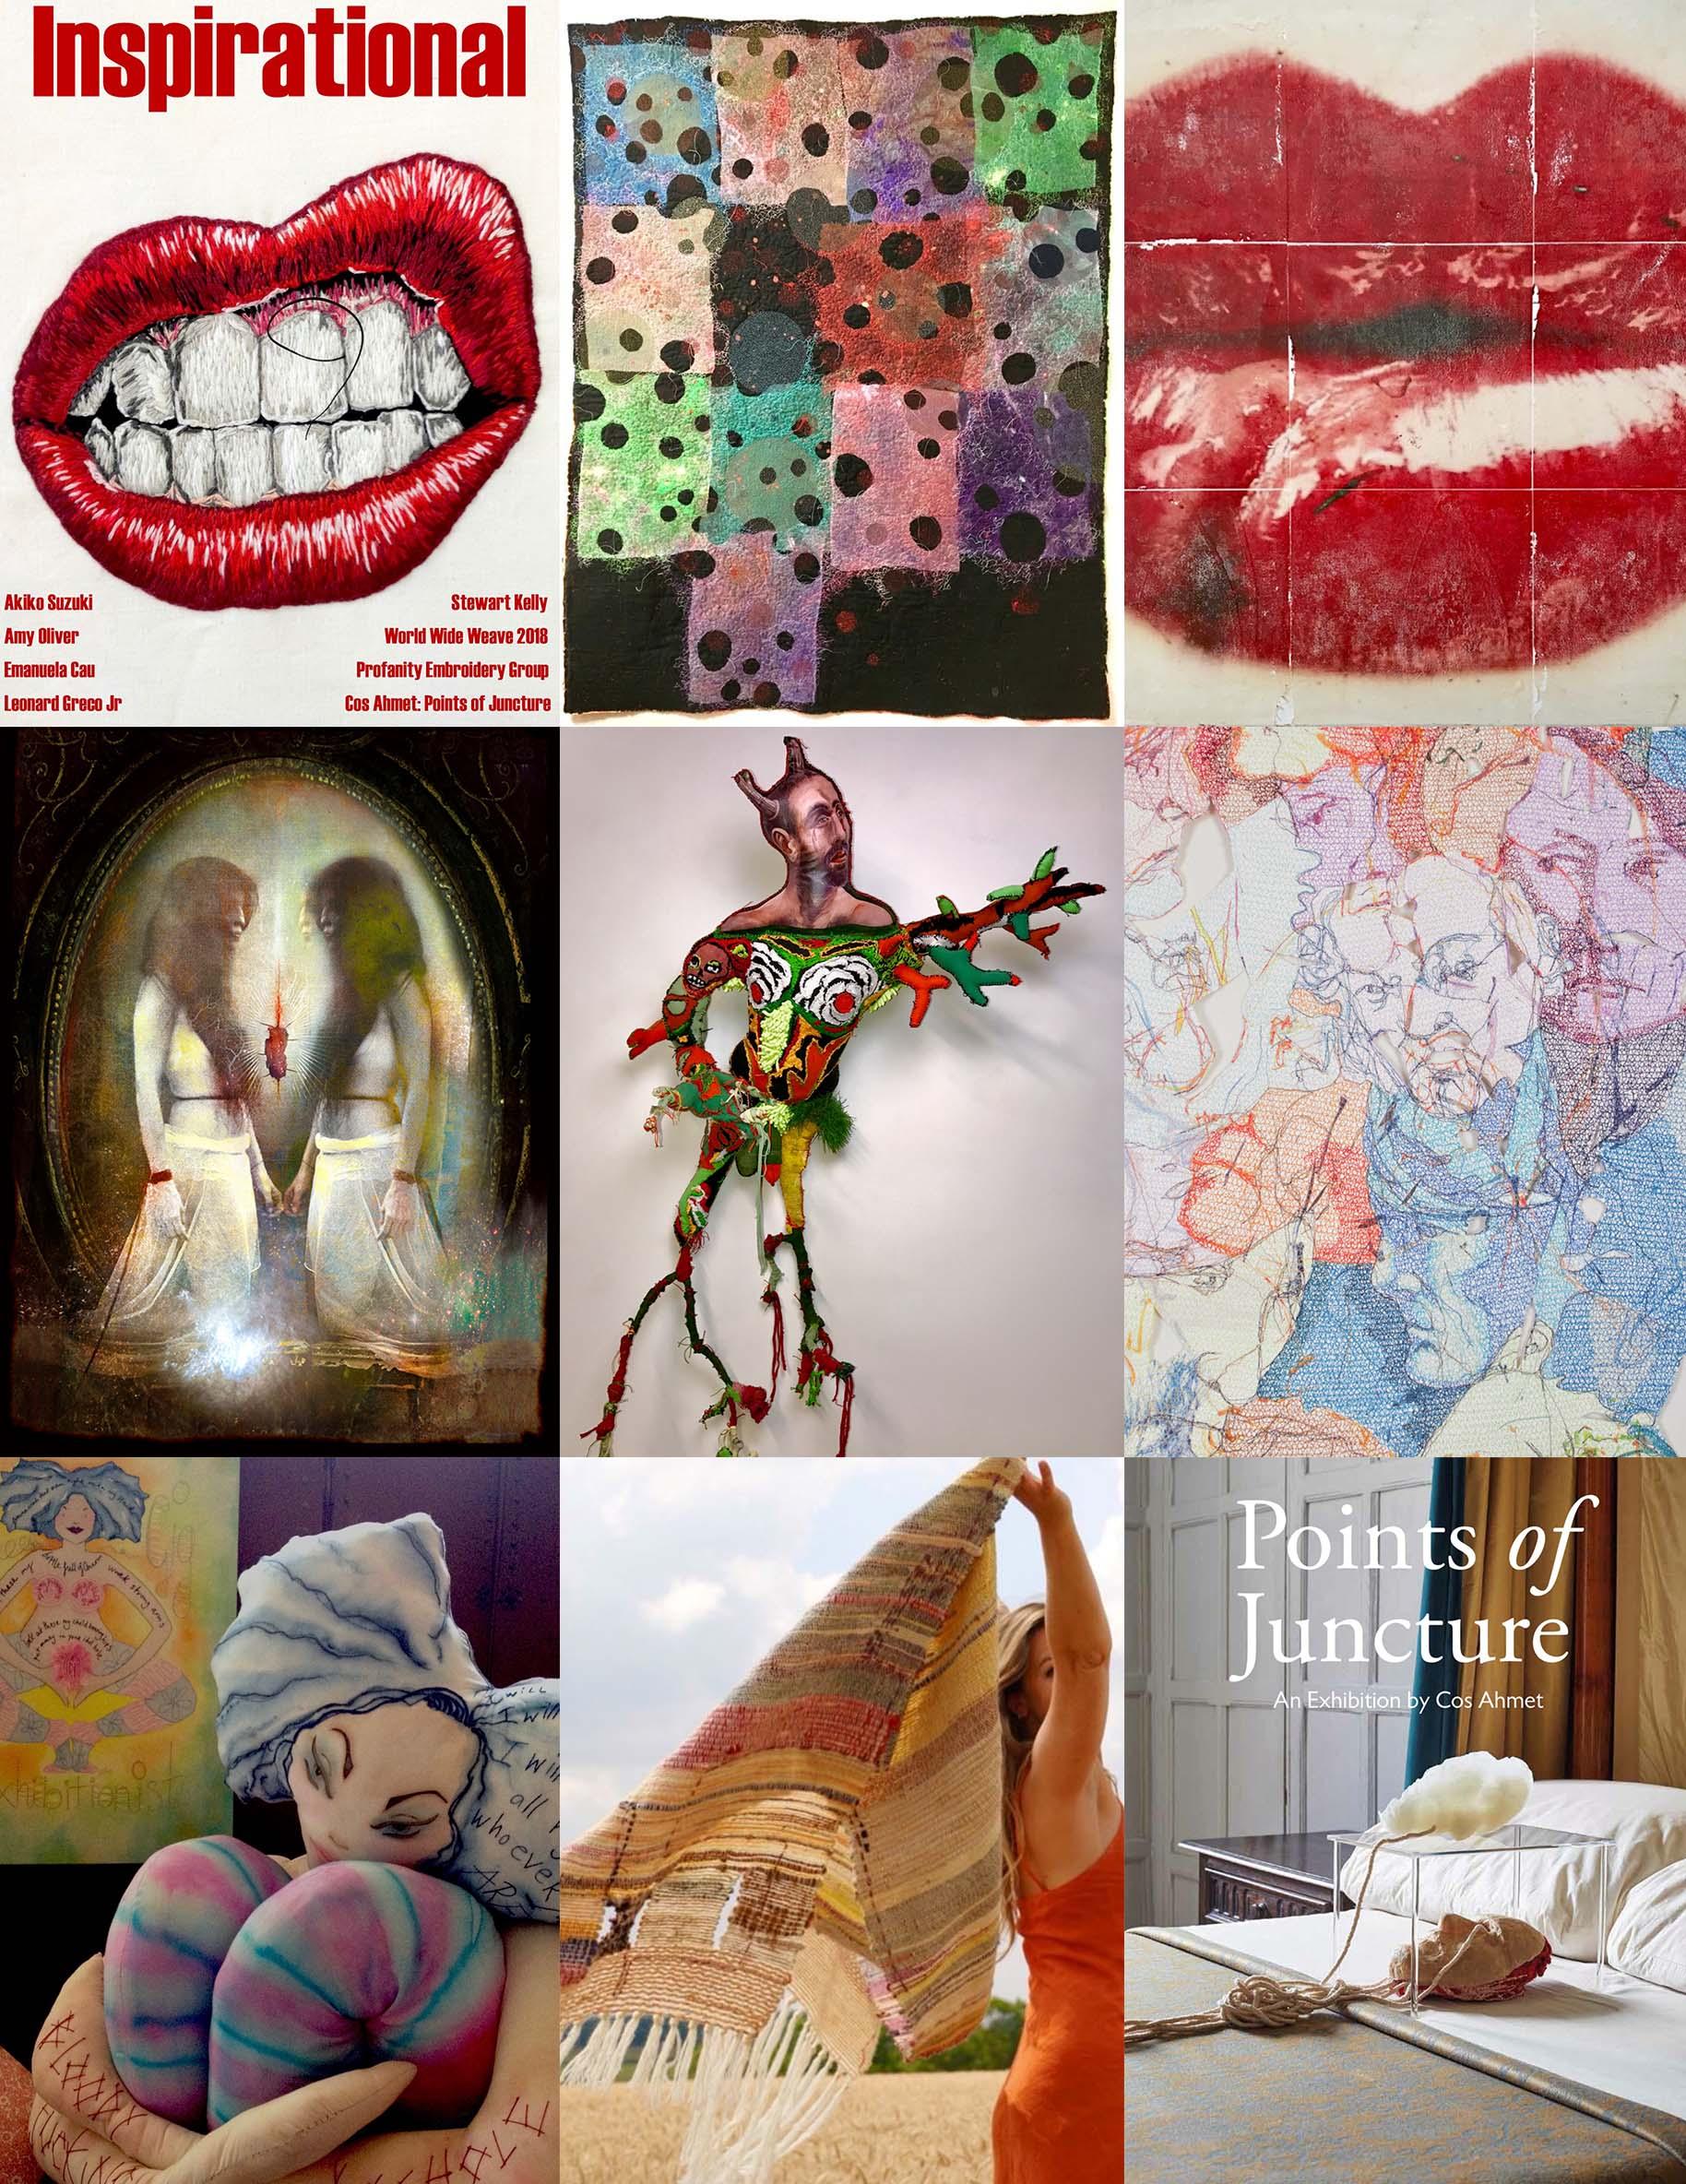 inspirational 17 artists-full